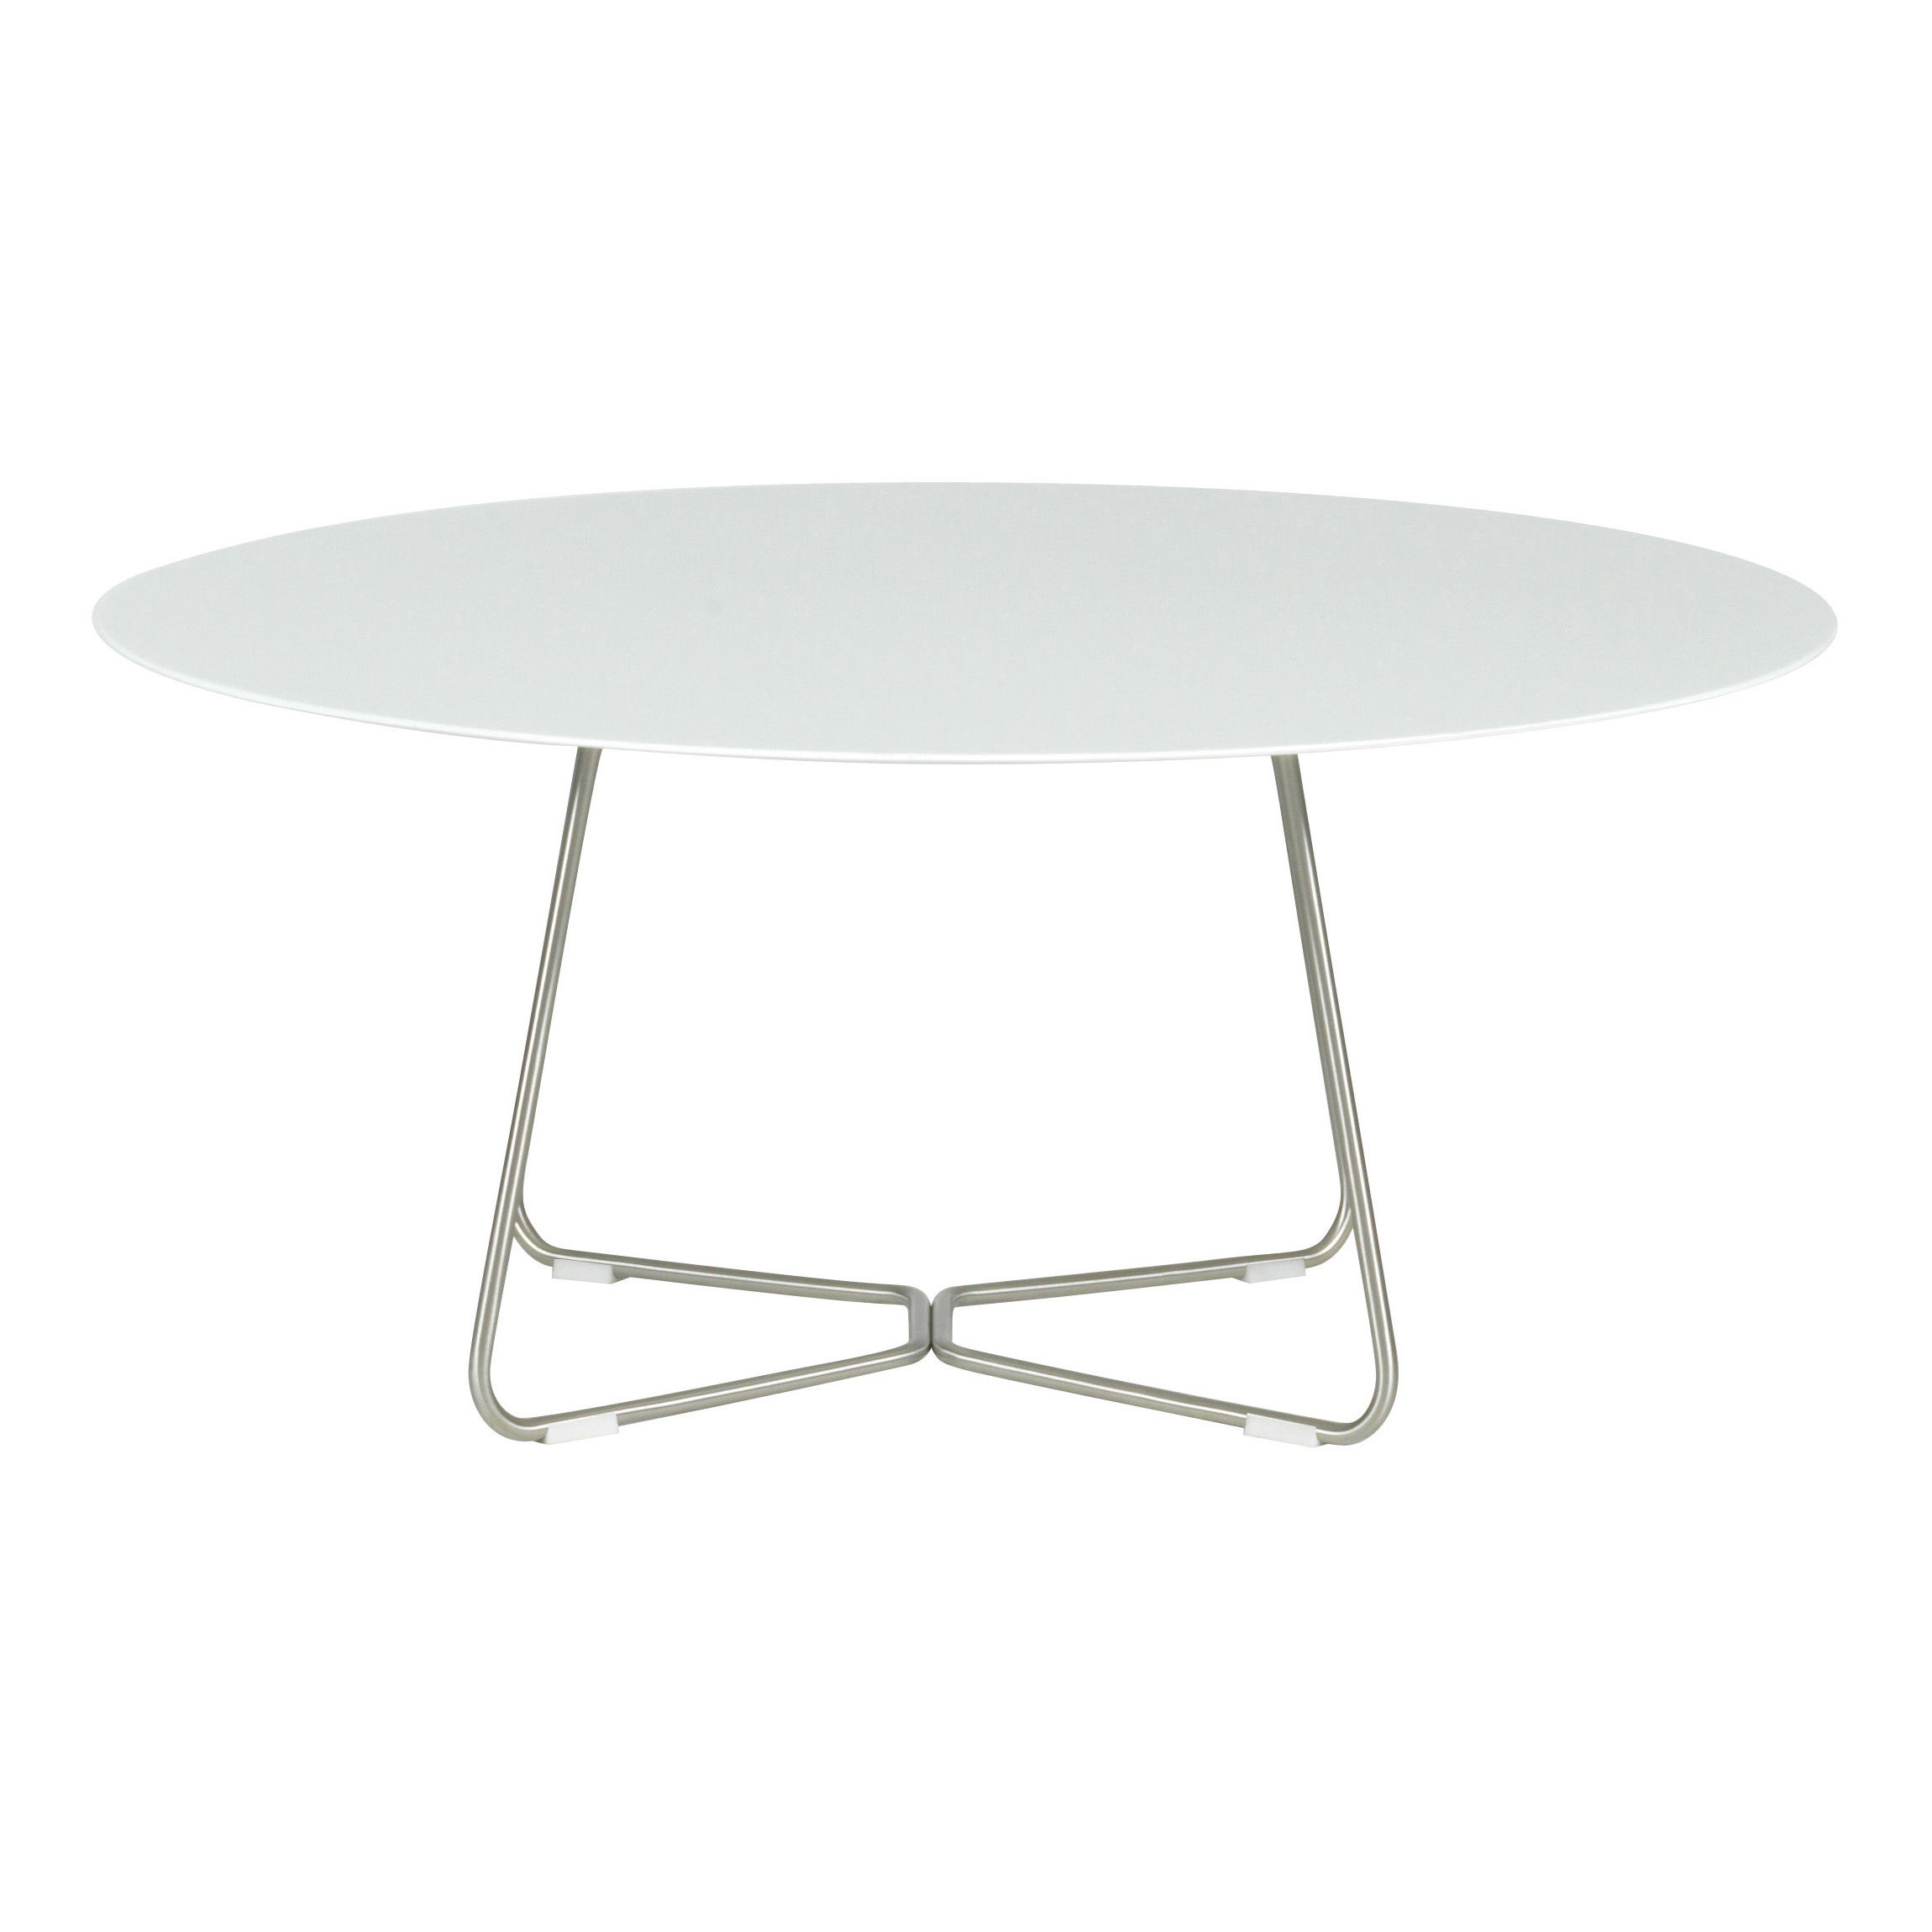 Slim Coffee Table H 40 Cm 90 Cm 90 Cm Corian White By Viteo